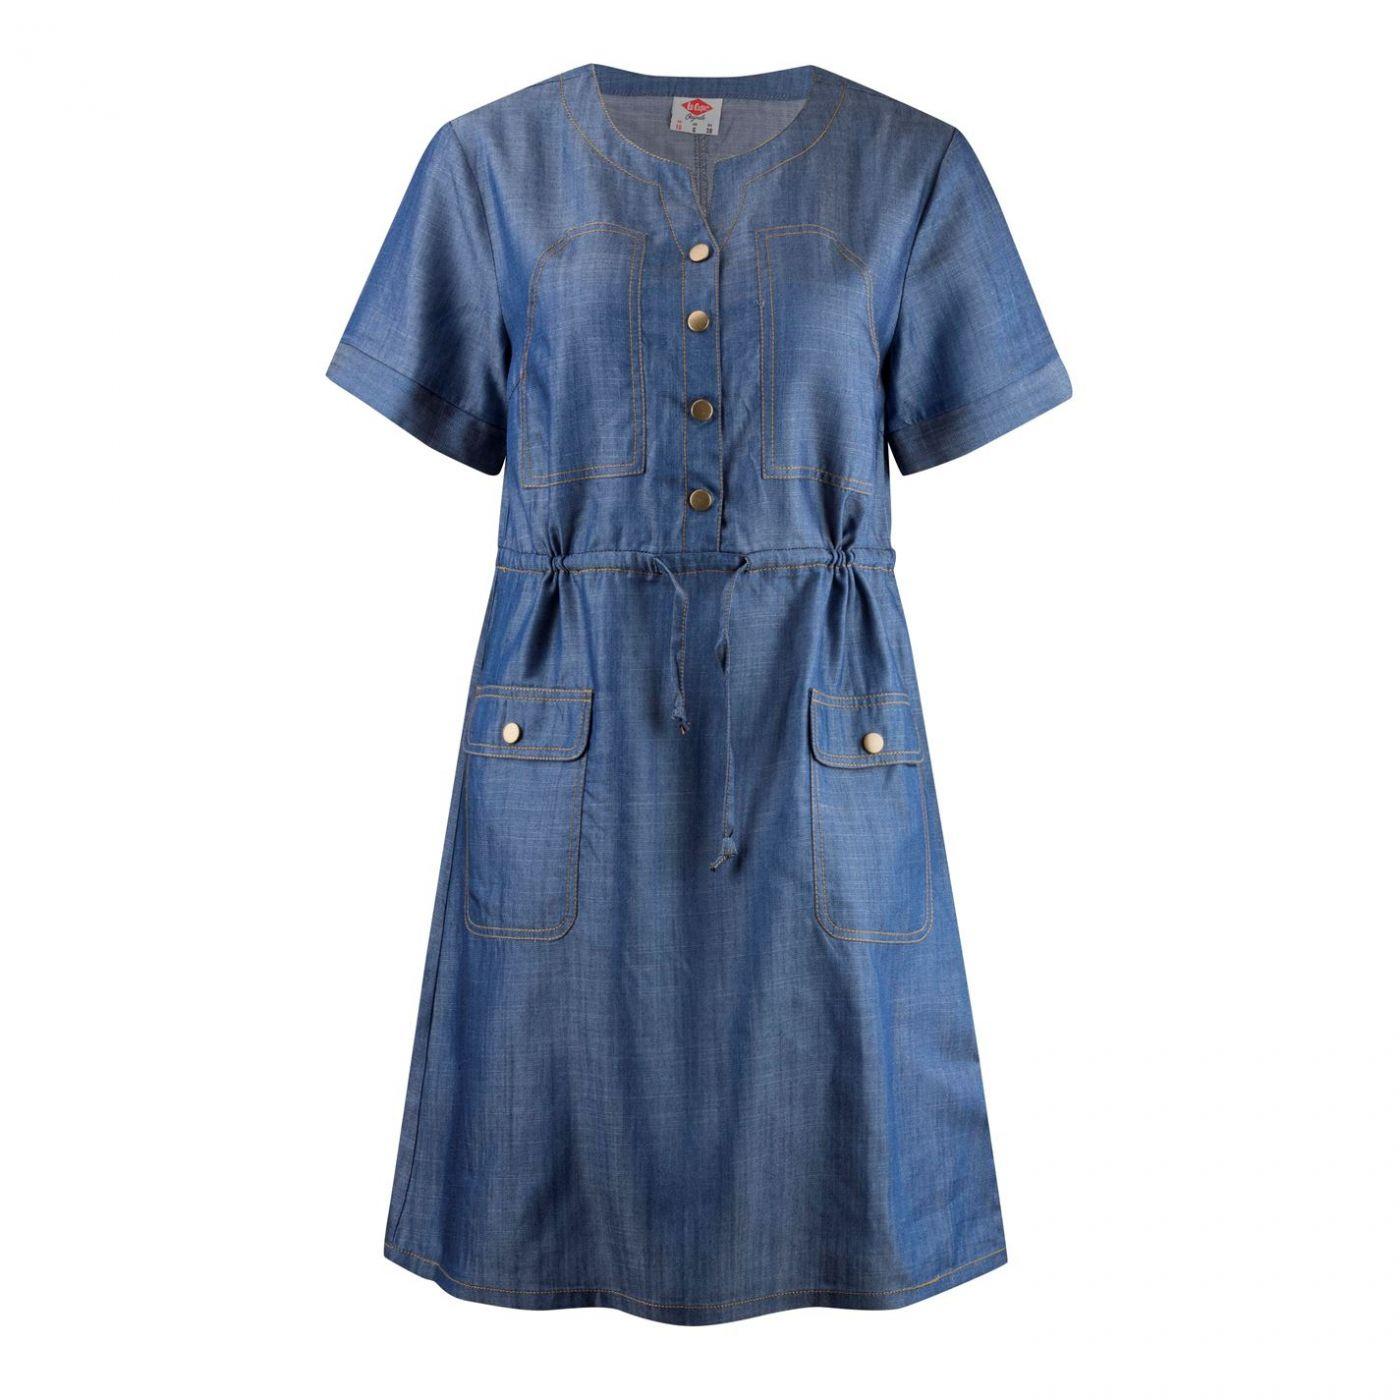 Lee Cooper Denim Shirt Dress Ladies